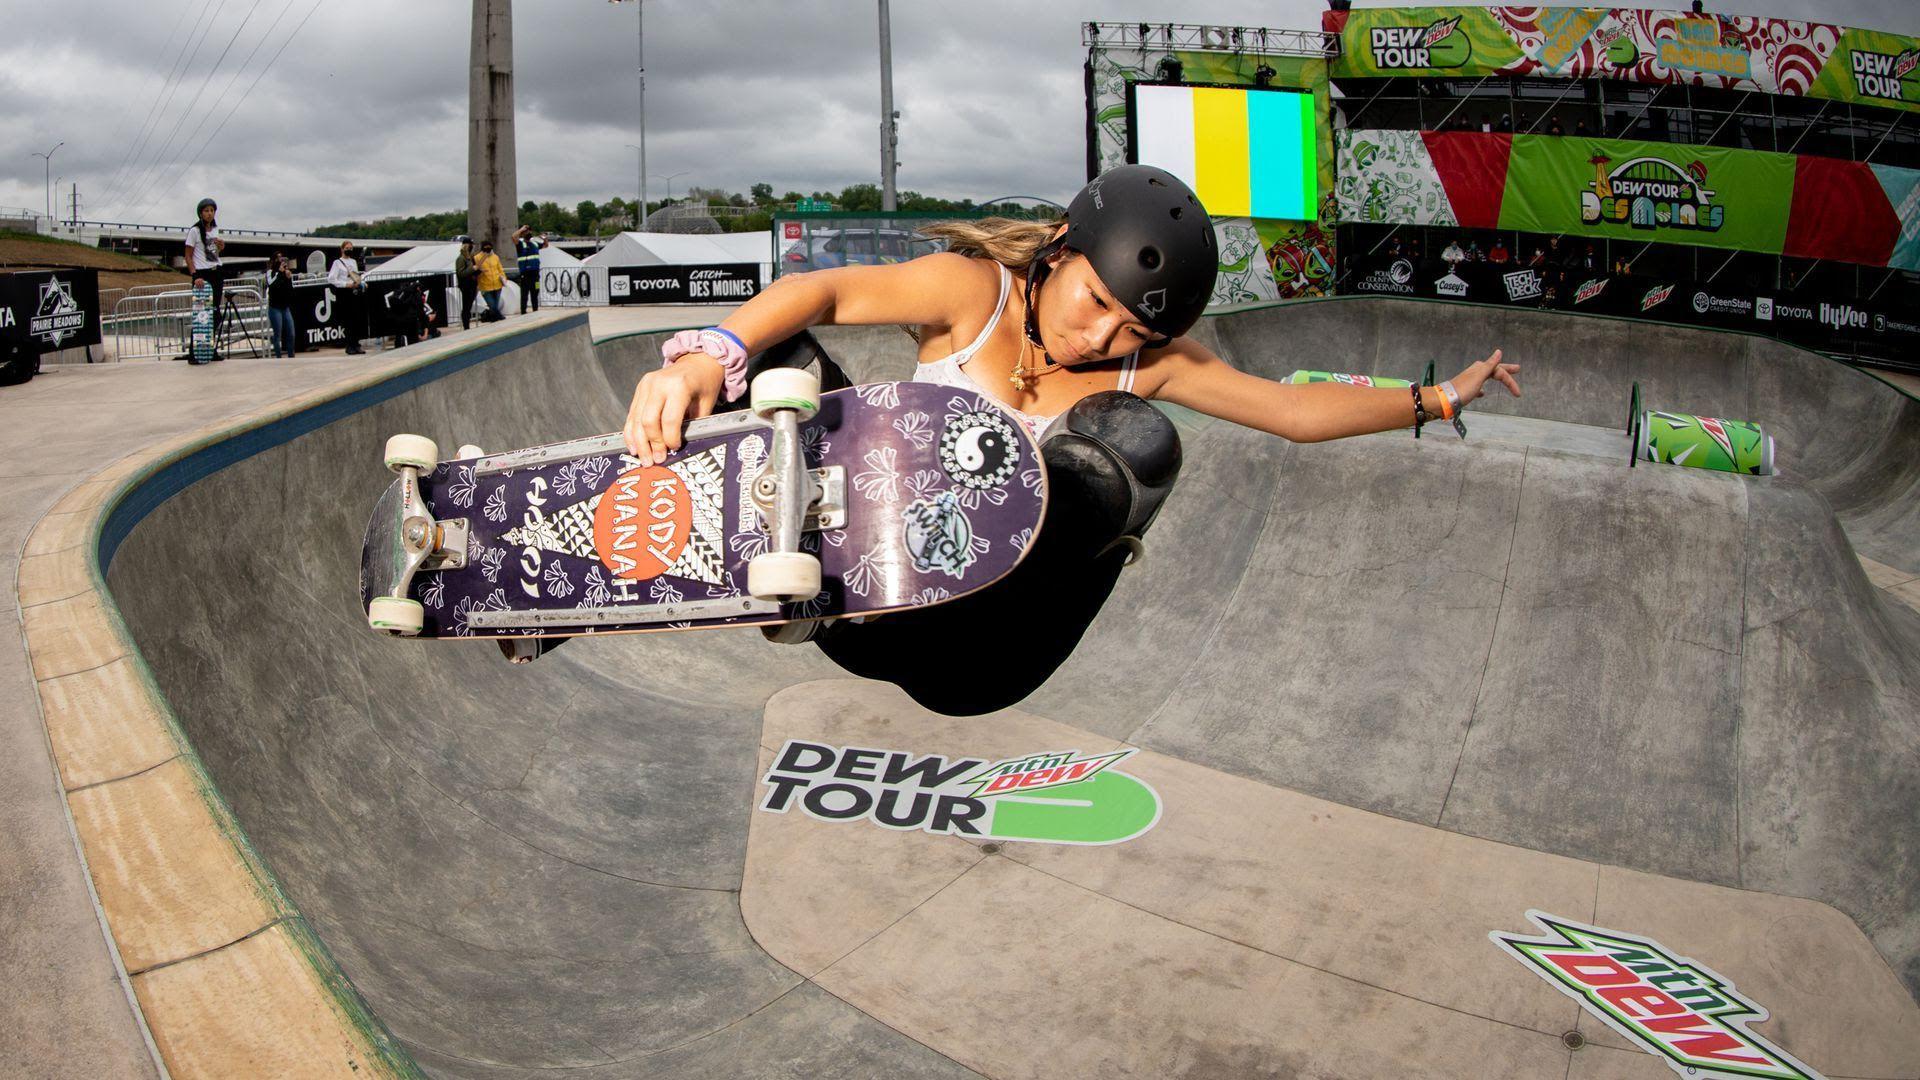 Kody Tamanaha, a professional skateboarder from Hawaii, practicing at the Lauridsen Skatepark.